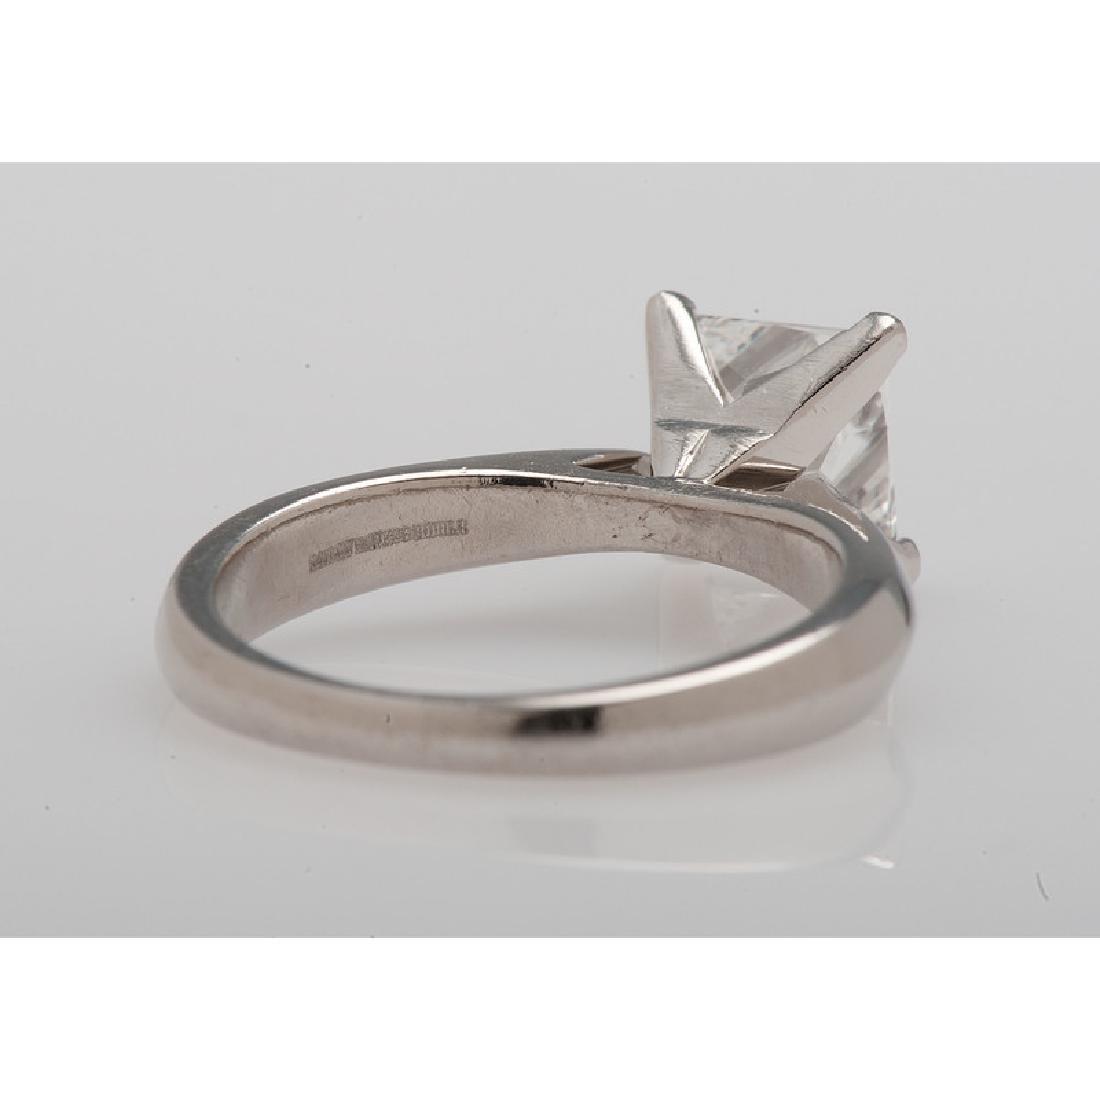 Bailey Banks & Biddle Platinum Diamond Ring - 3